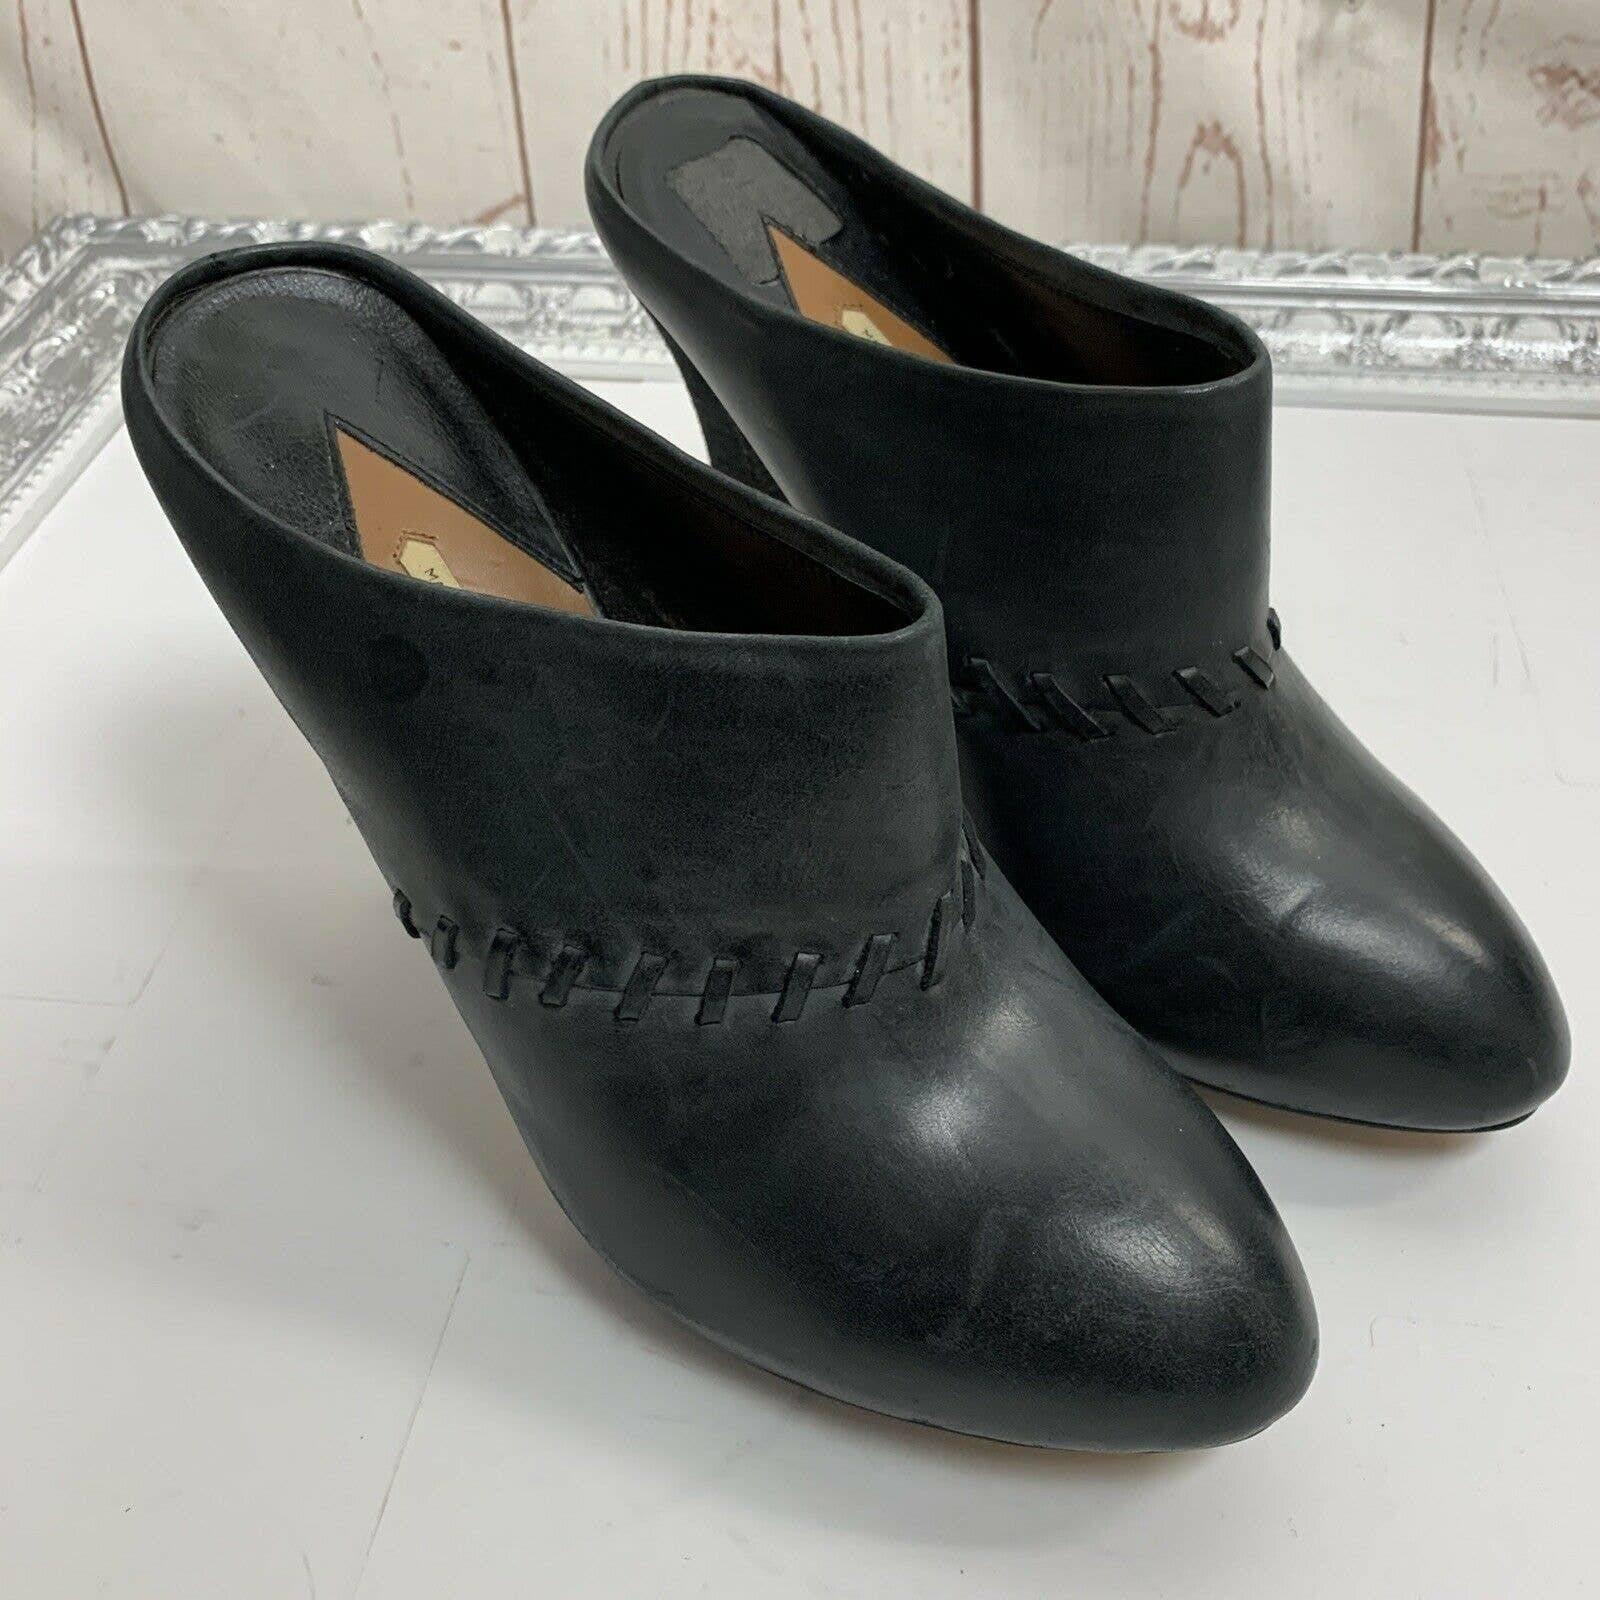 Max Studio Luna high heel mules size 9M